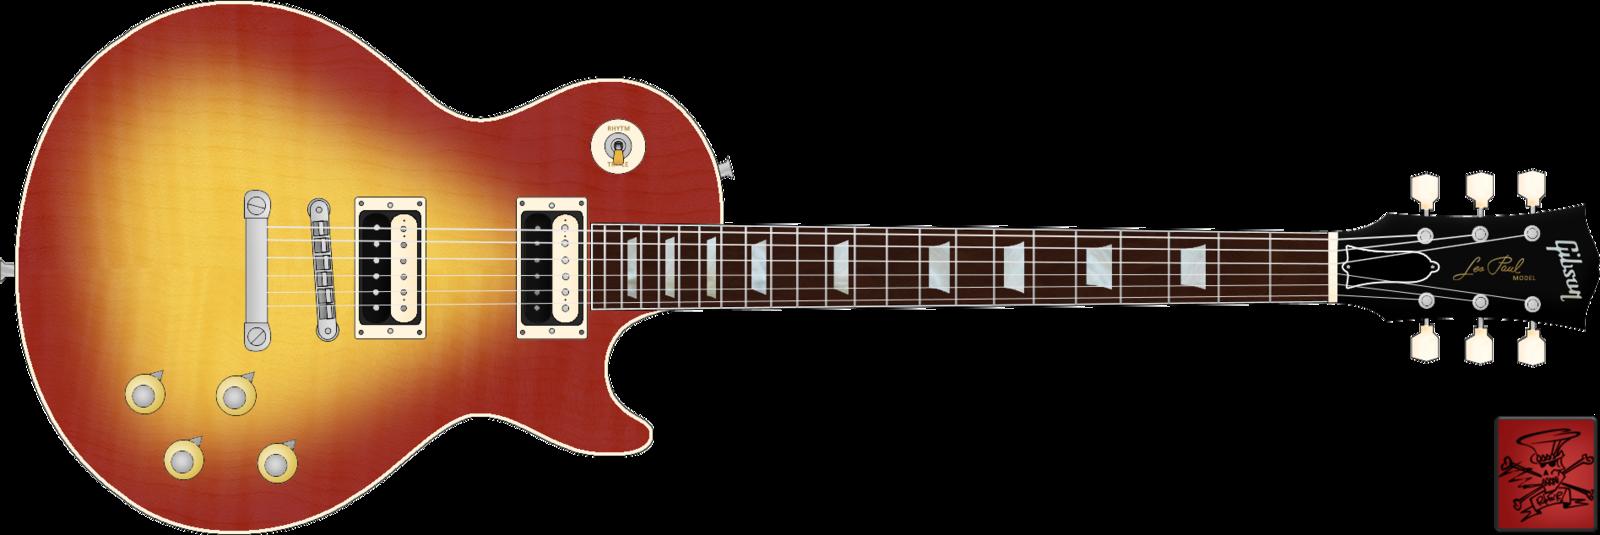 1600x535 Gibson Les Paul Standard (V3) By Spillnerlol